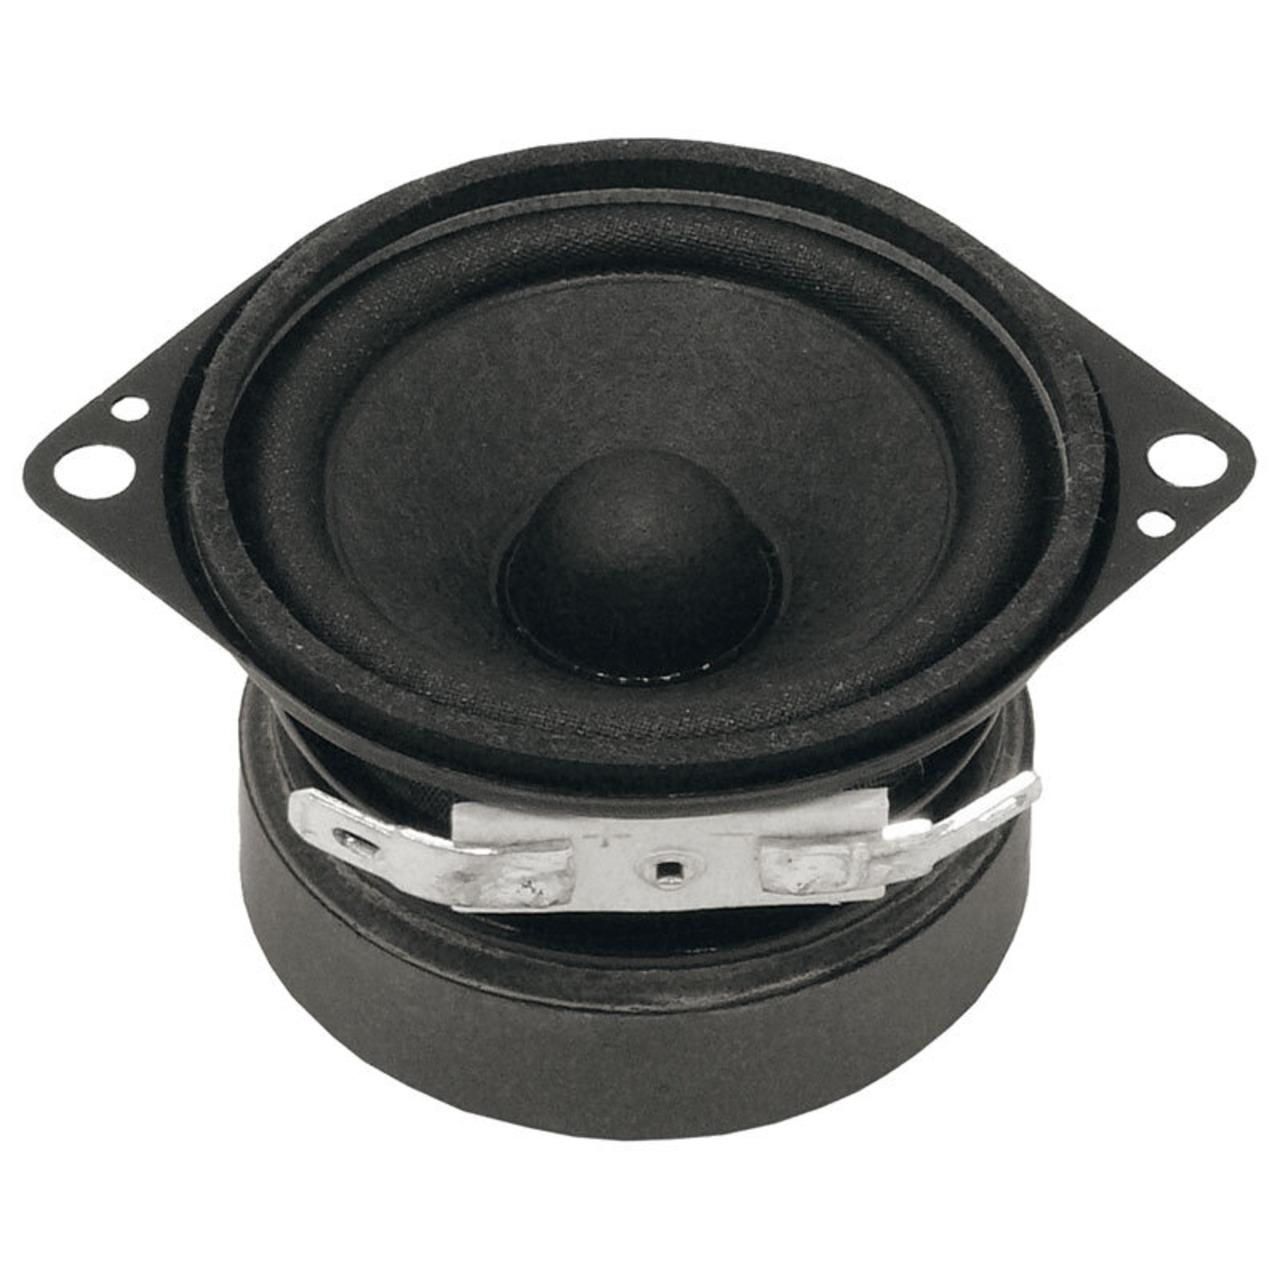 VISATON Breitbandlautsprecher- 5 cm- FRS 5 XTS- 8 Ohm